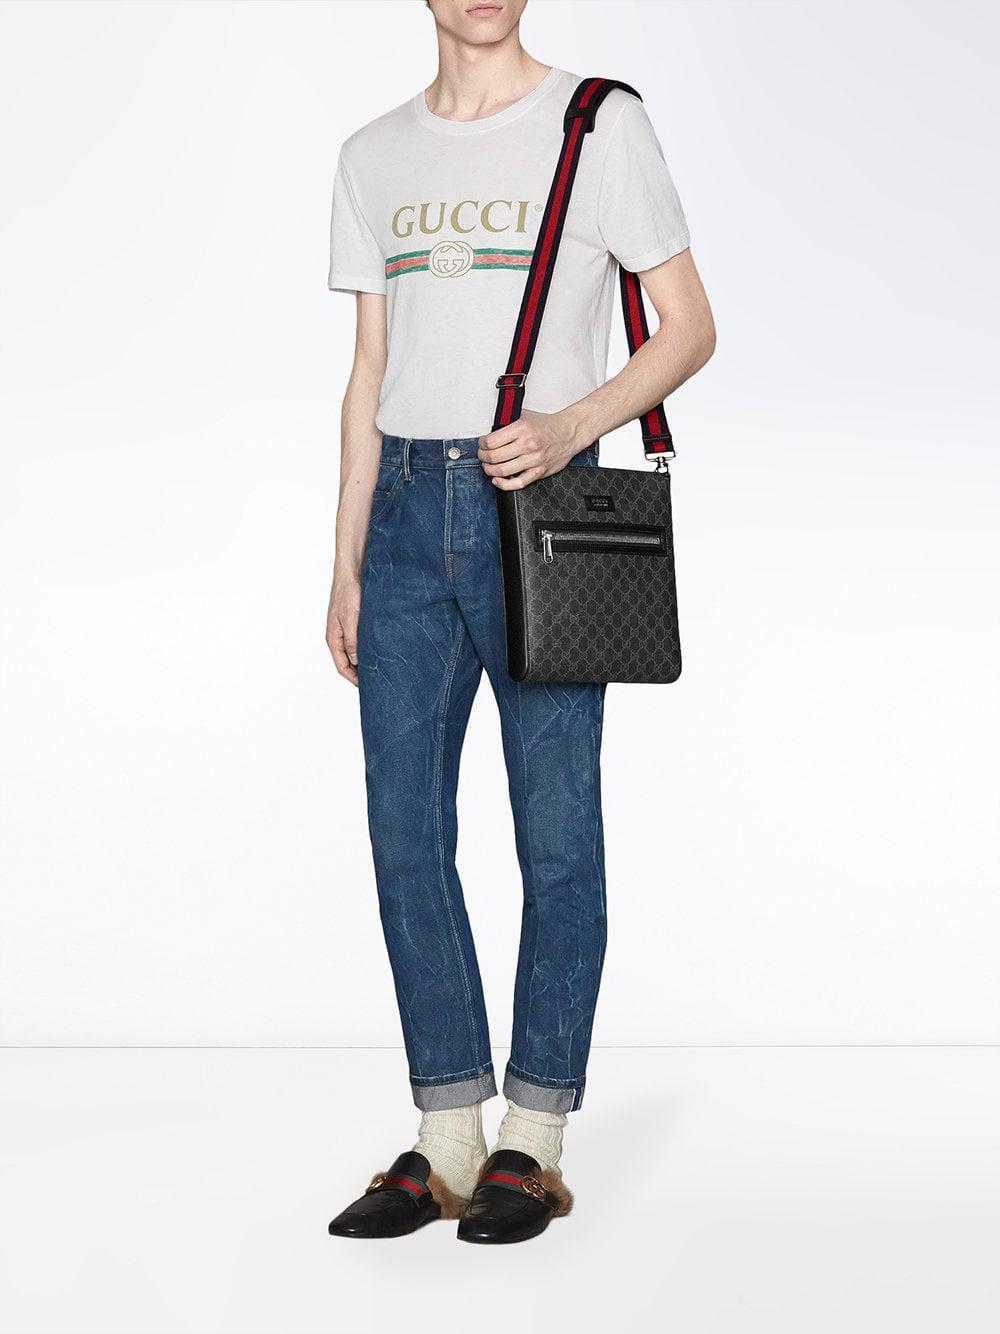 35dc7e62f892 Lyst - Gucci GG Supreme Messenger Bag in Black for Men - Save 3%